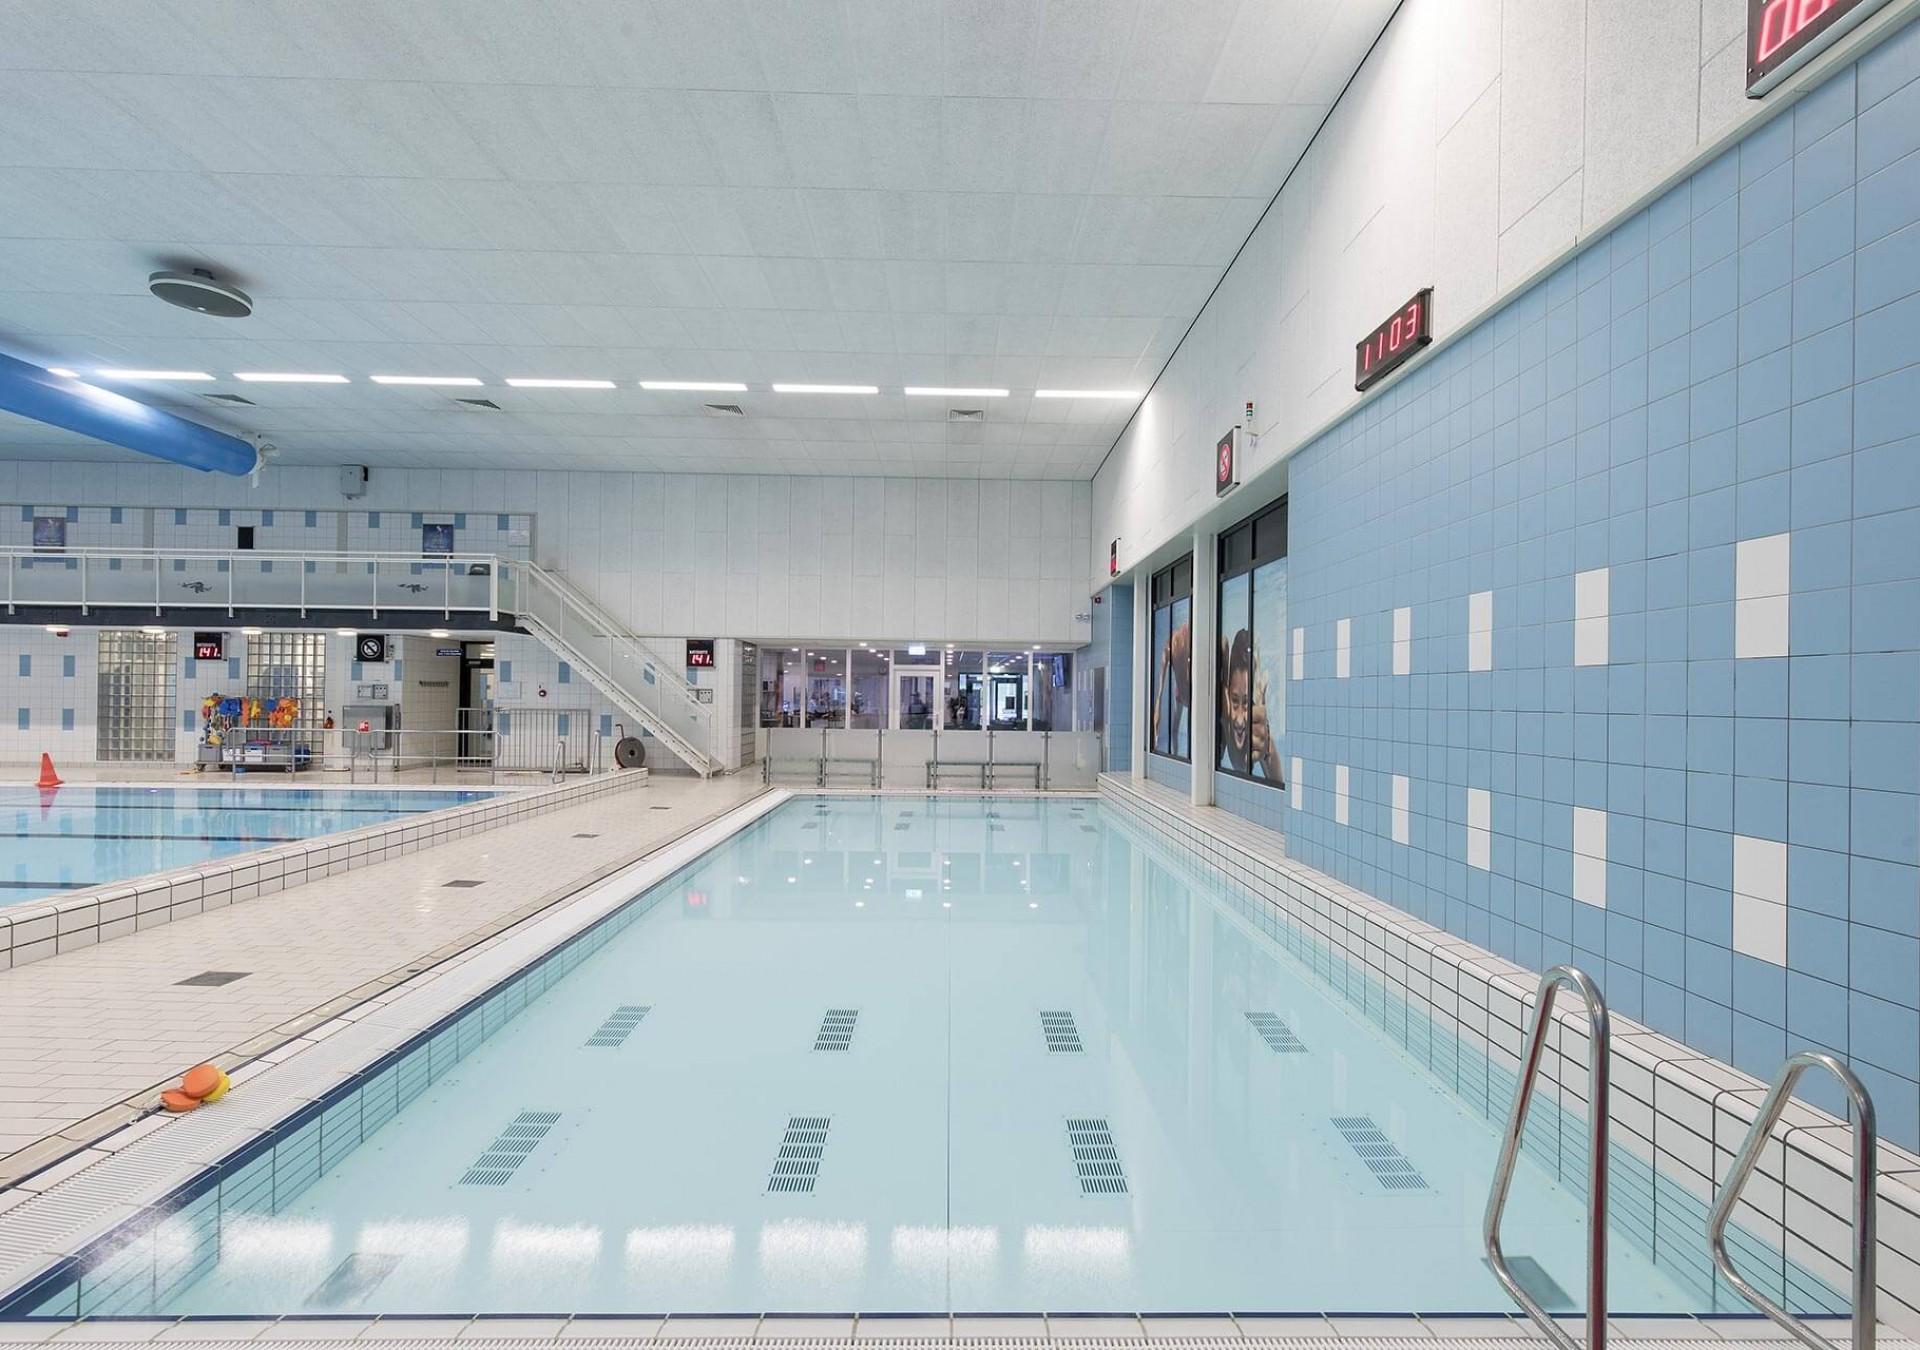 Zwembad ijsselmonde u sportbedrijf rotterdam